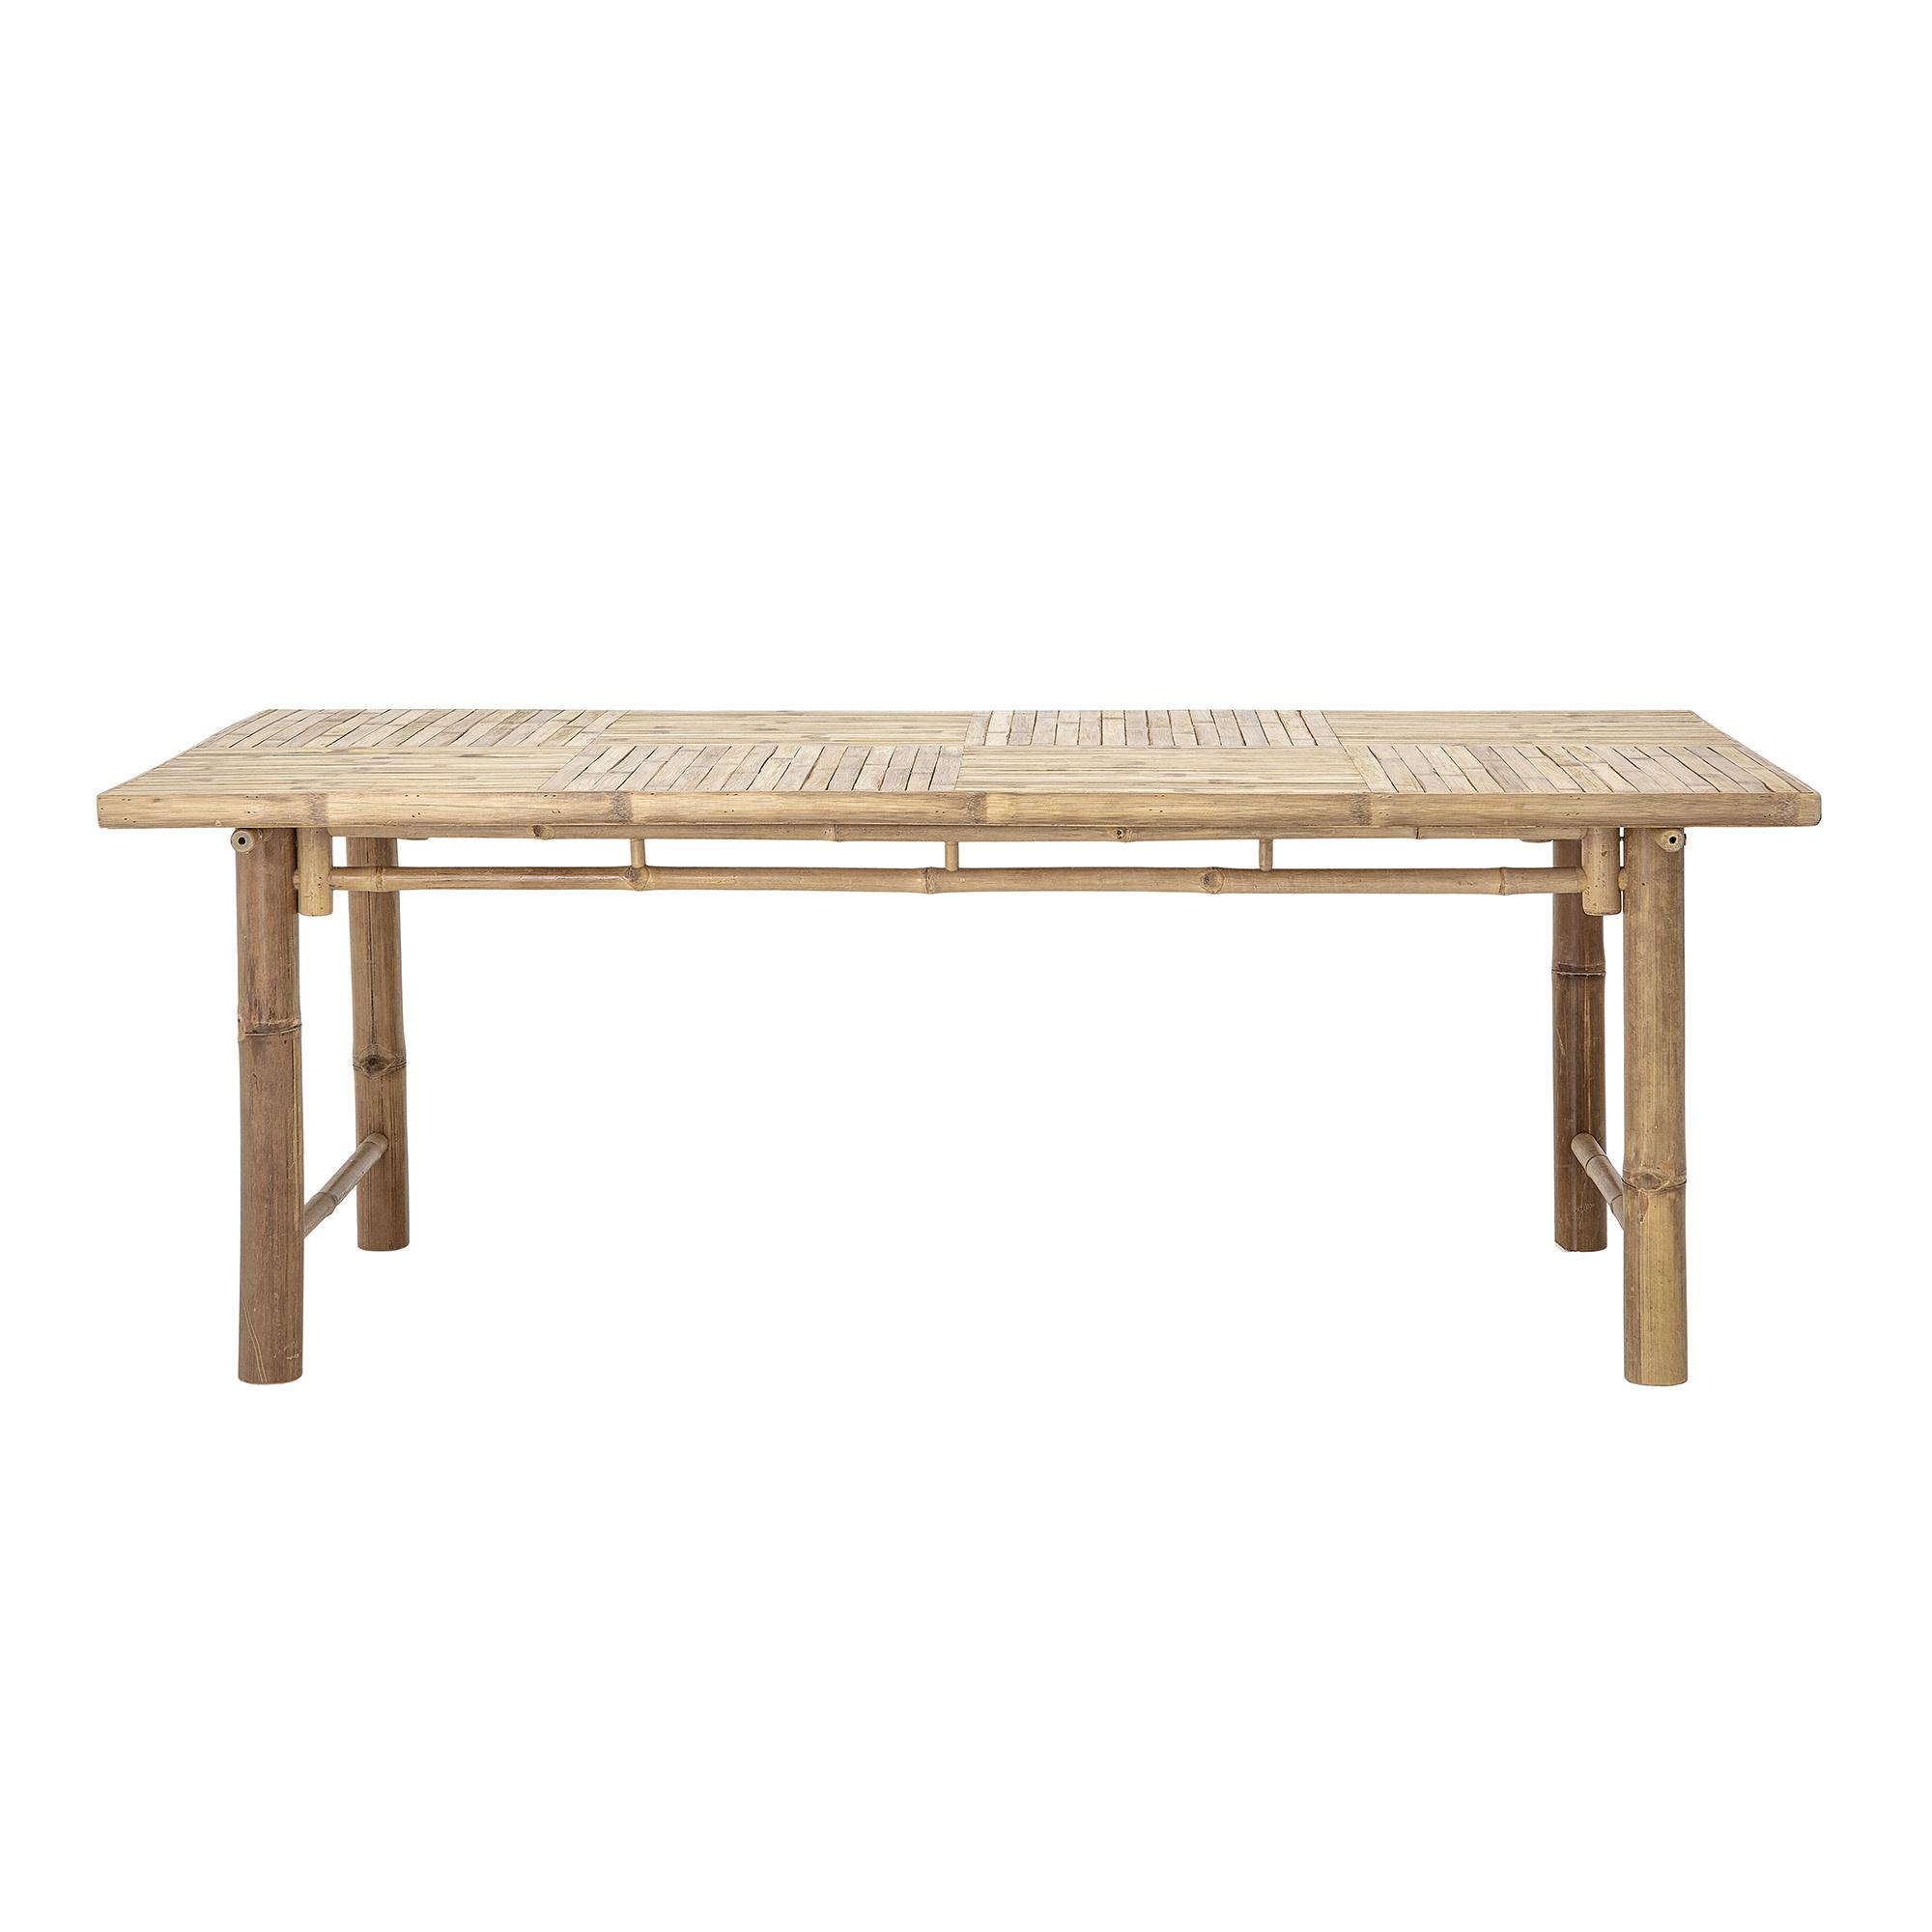 Bloomingville Table de jardin - bambou Naturel - L200xH74xW100 - Bloomingville